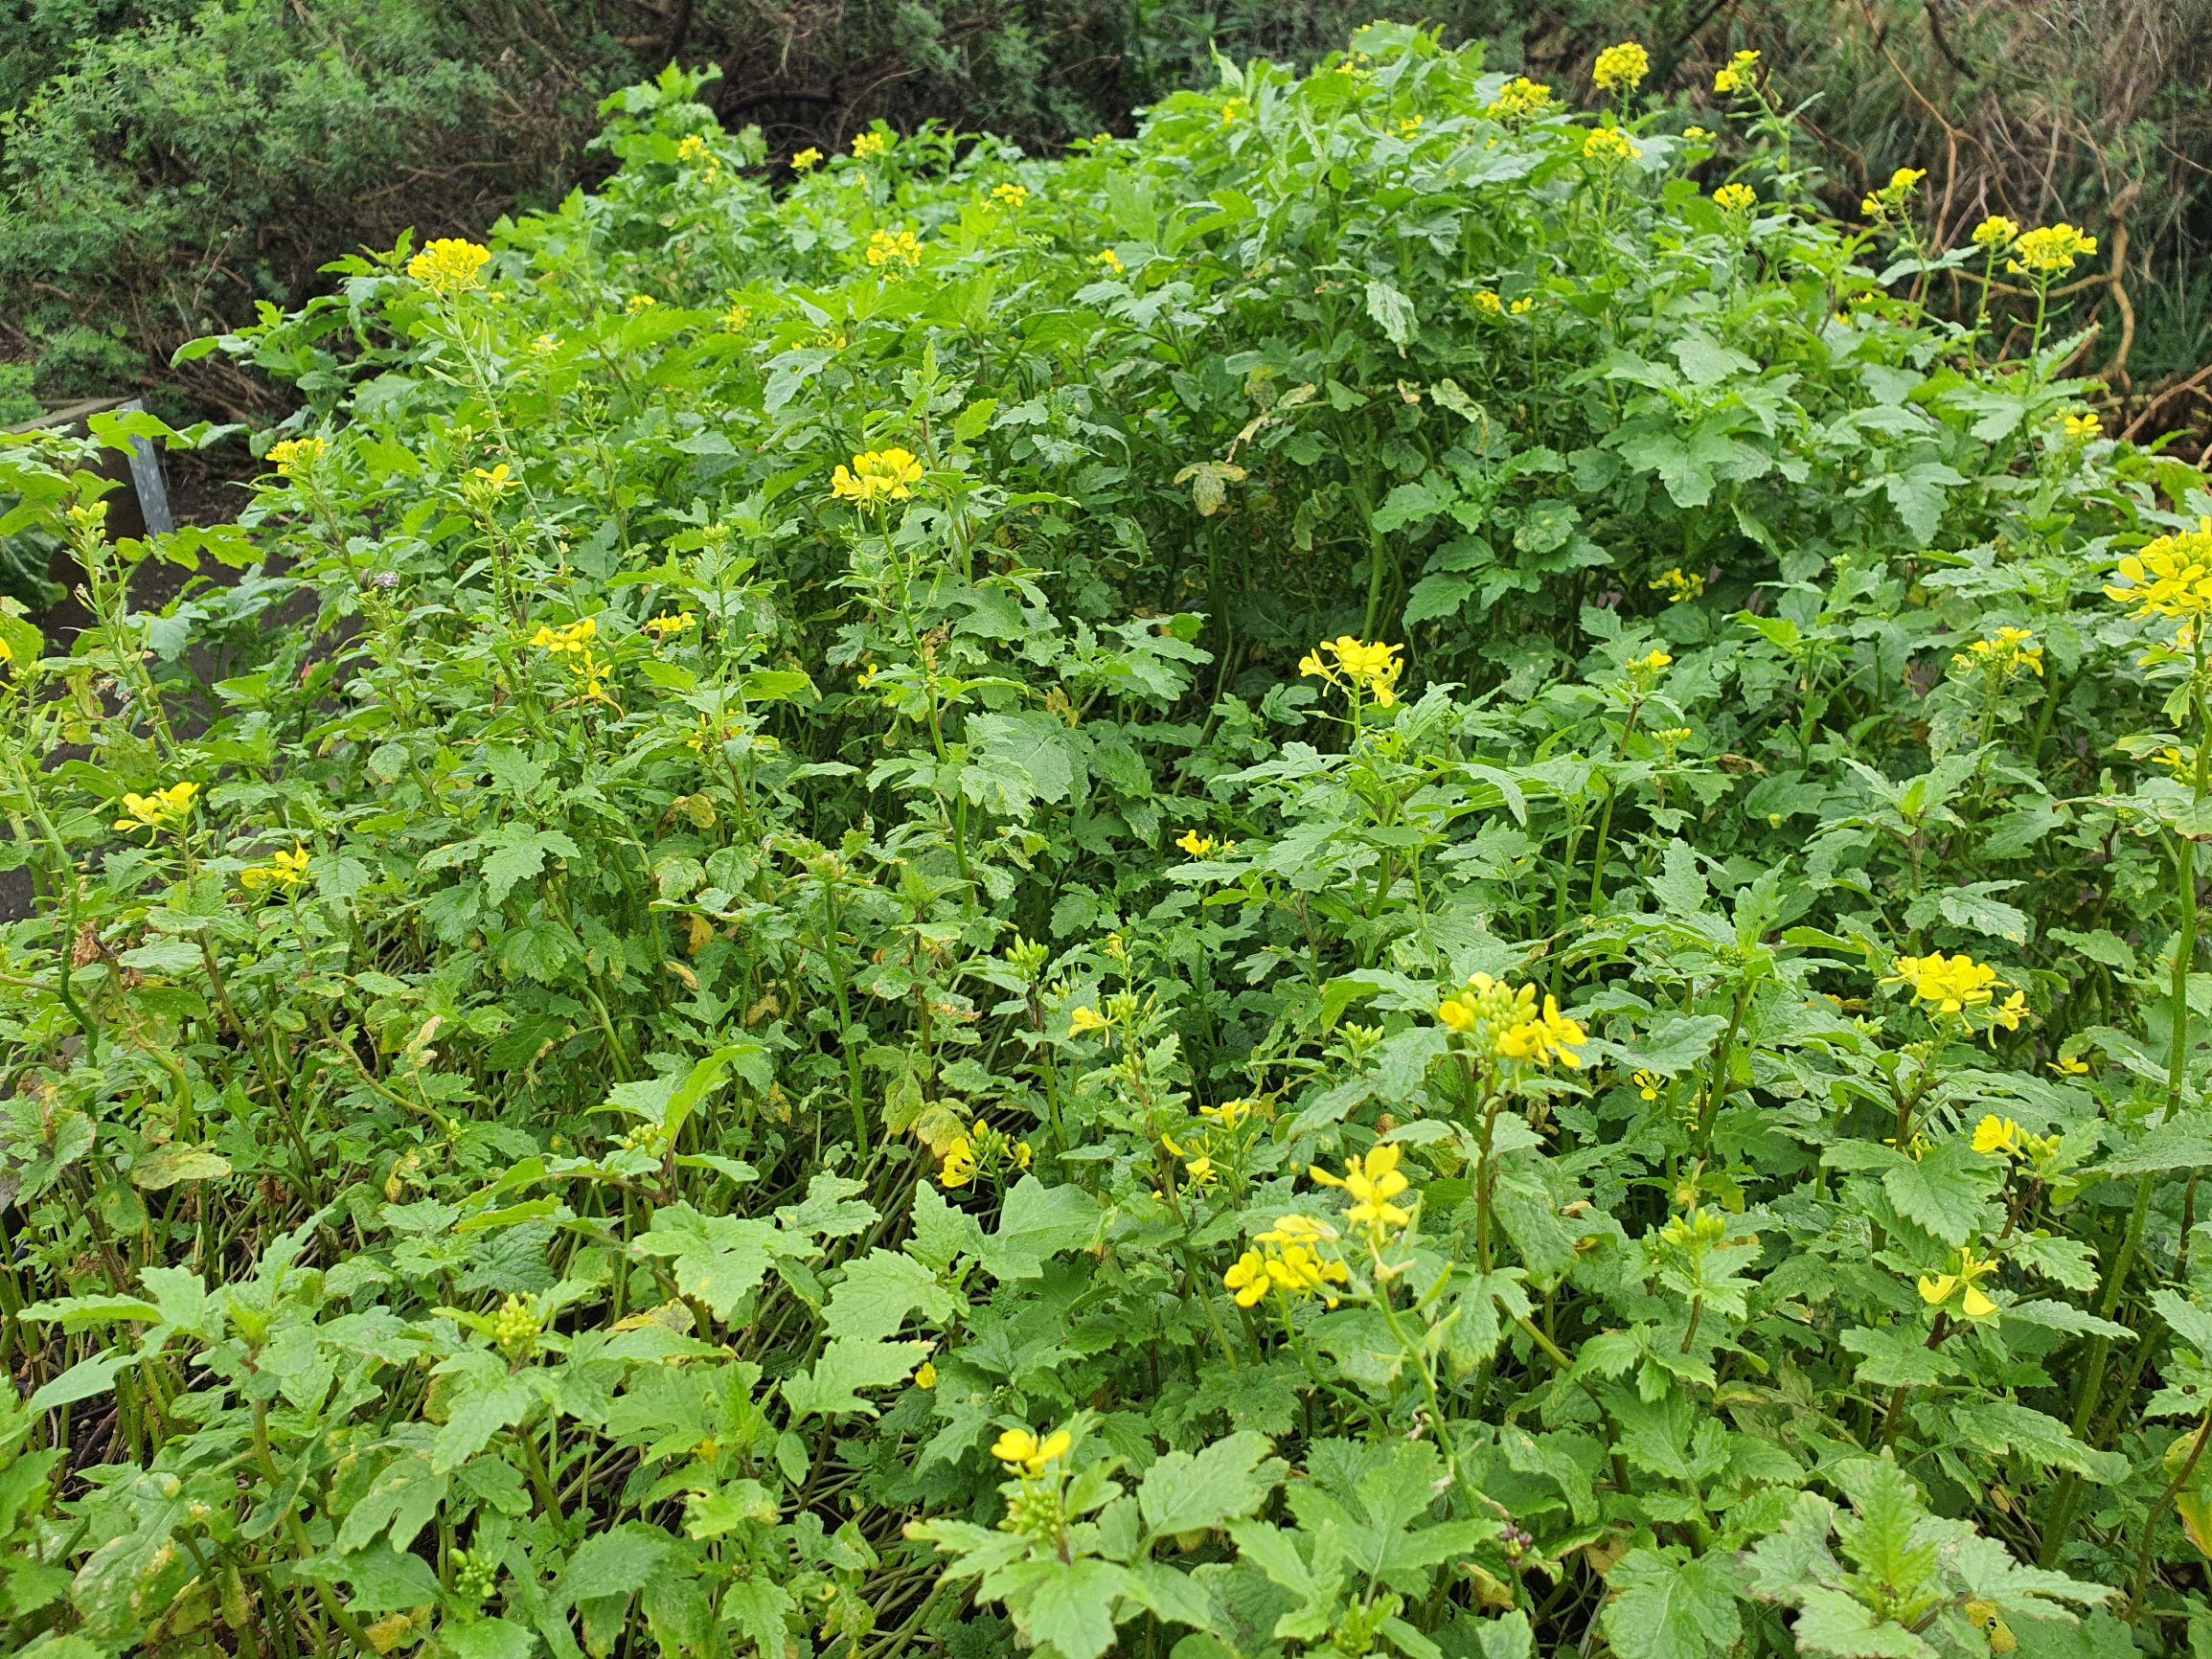 Mustard cover crop